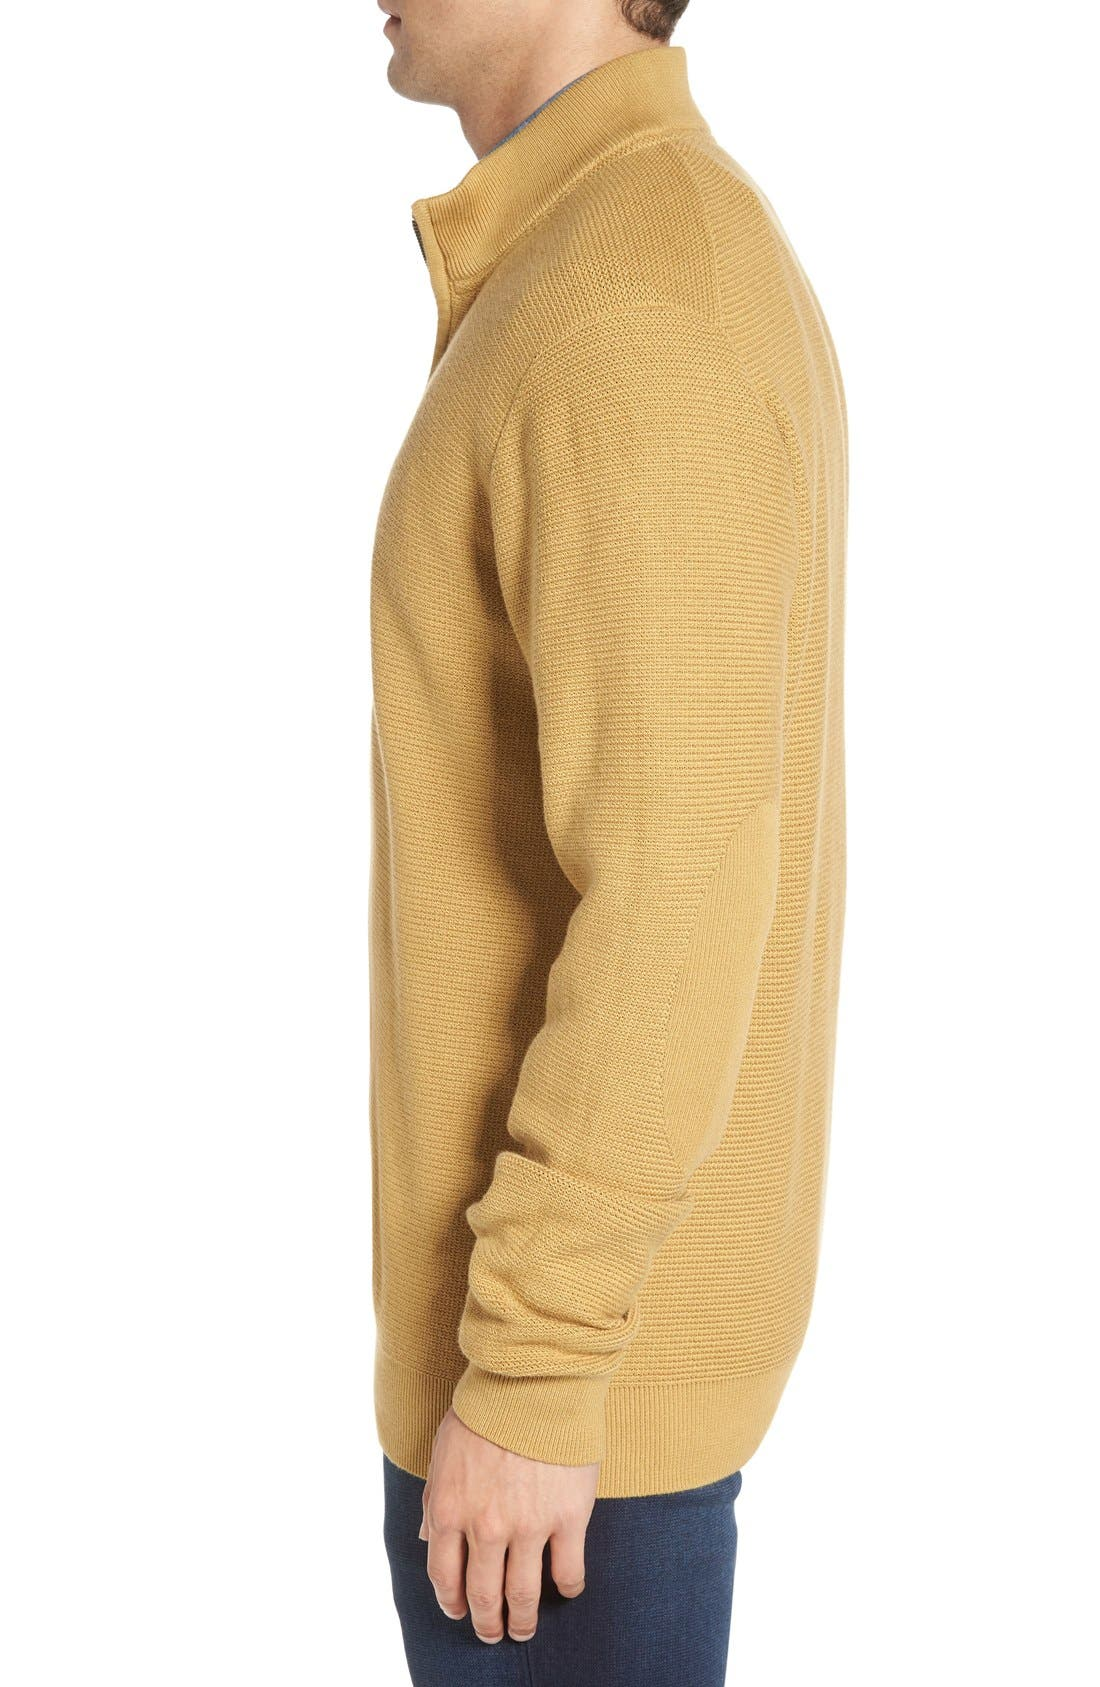 'Benson' Quarter Zip Textured Knit Sweater,                             Alternate thumbnail 15, color,